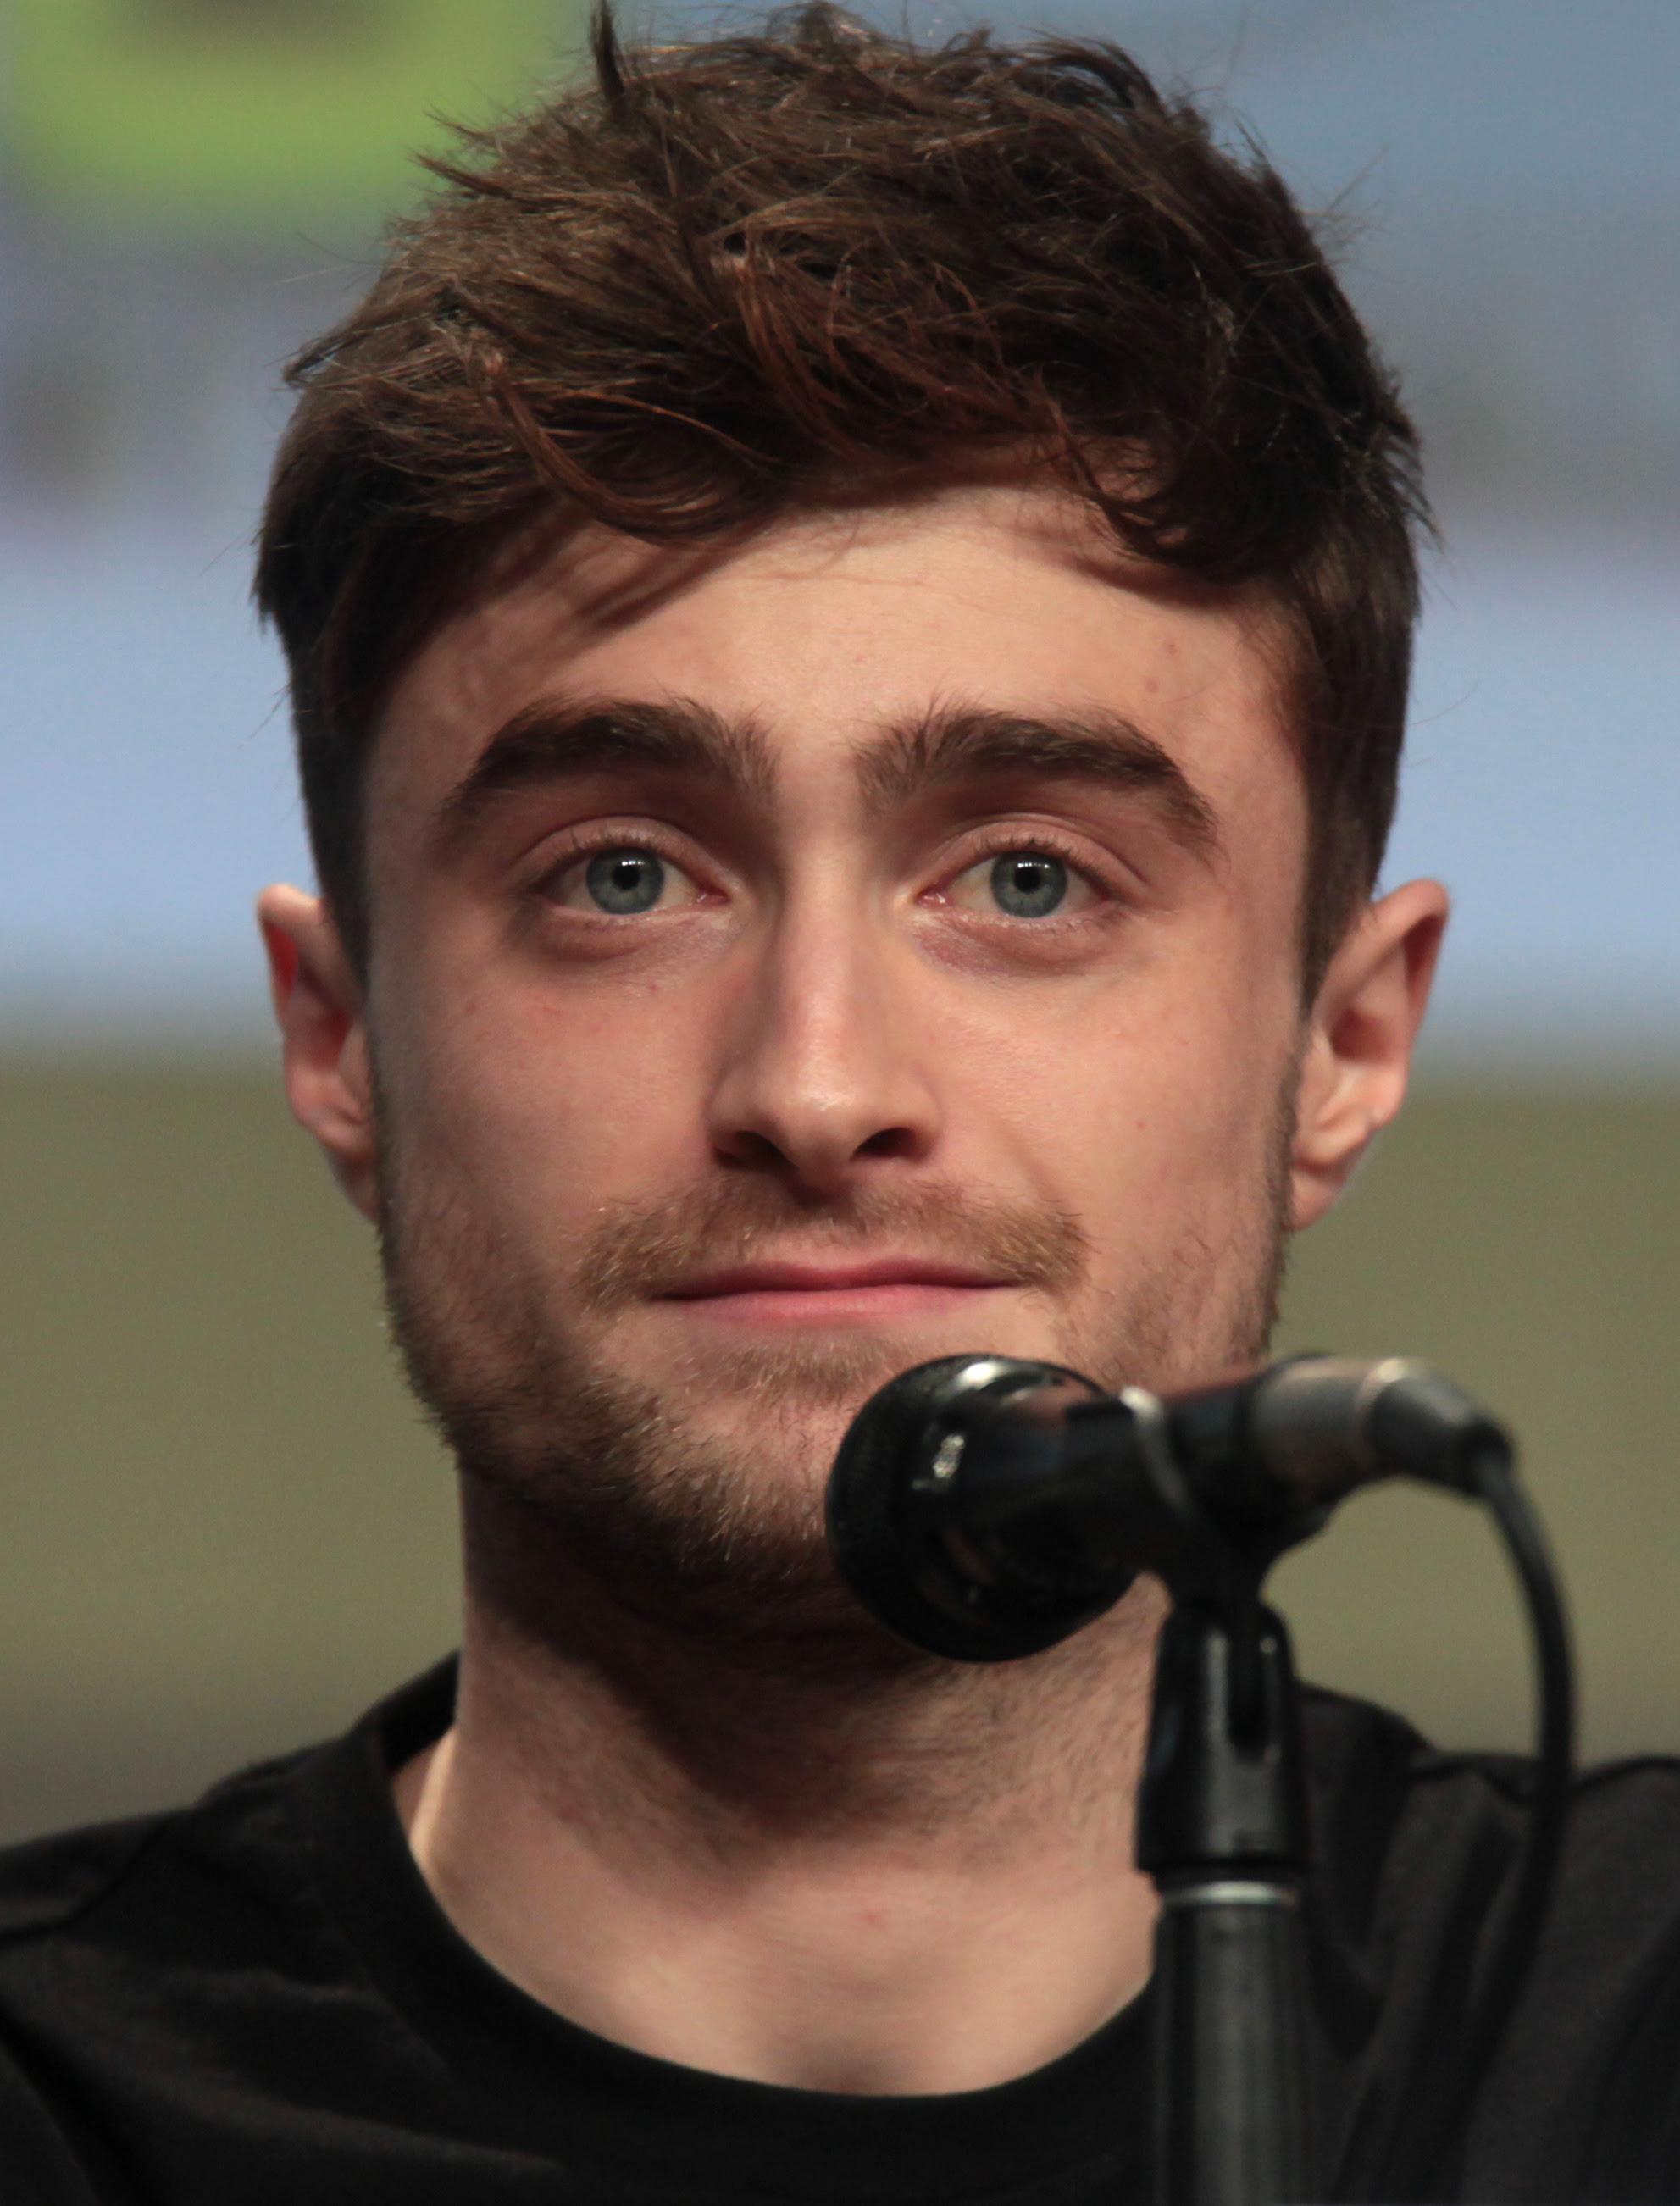 Bintang 'Harry Potter',Daniel Radcliffe. Dikabarkan Akan Menjadi Bintang Serial 'Grand Theft Auto'